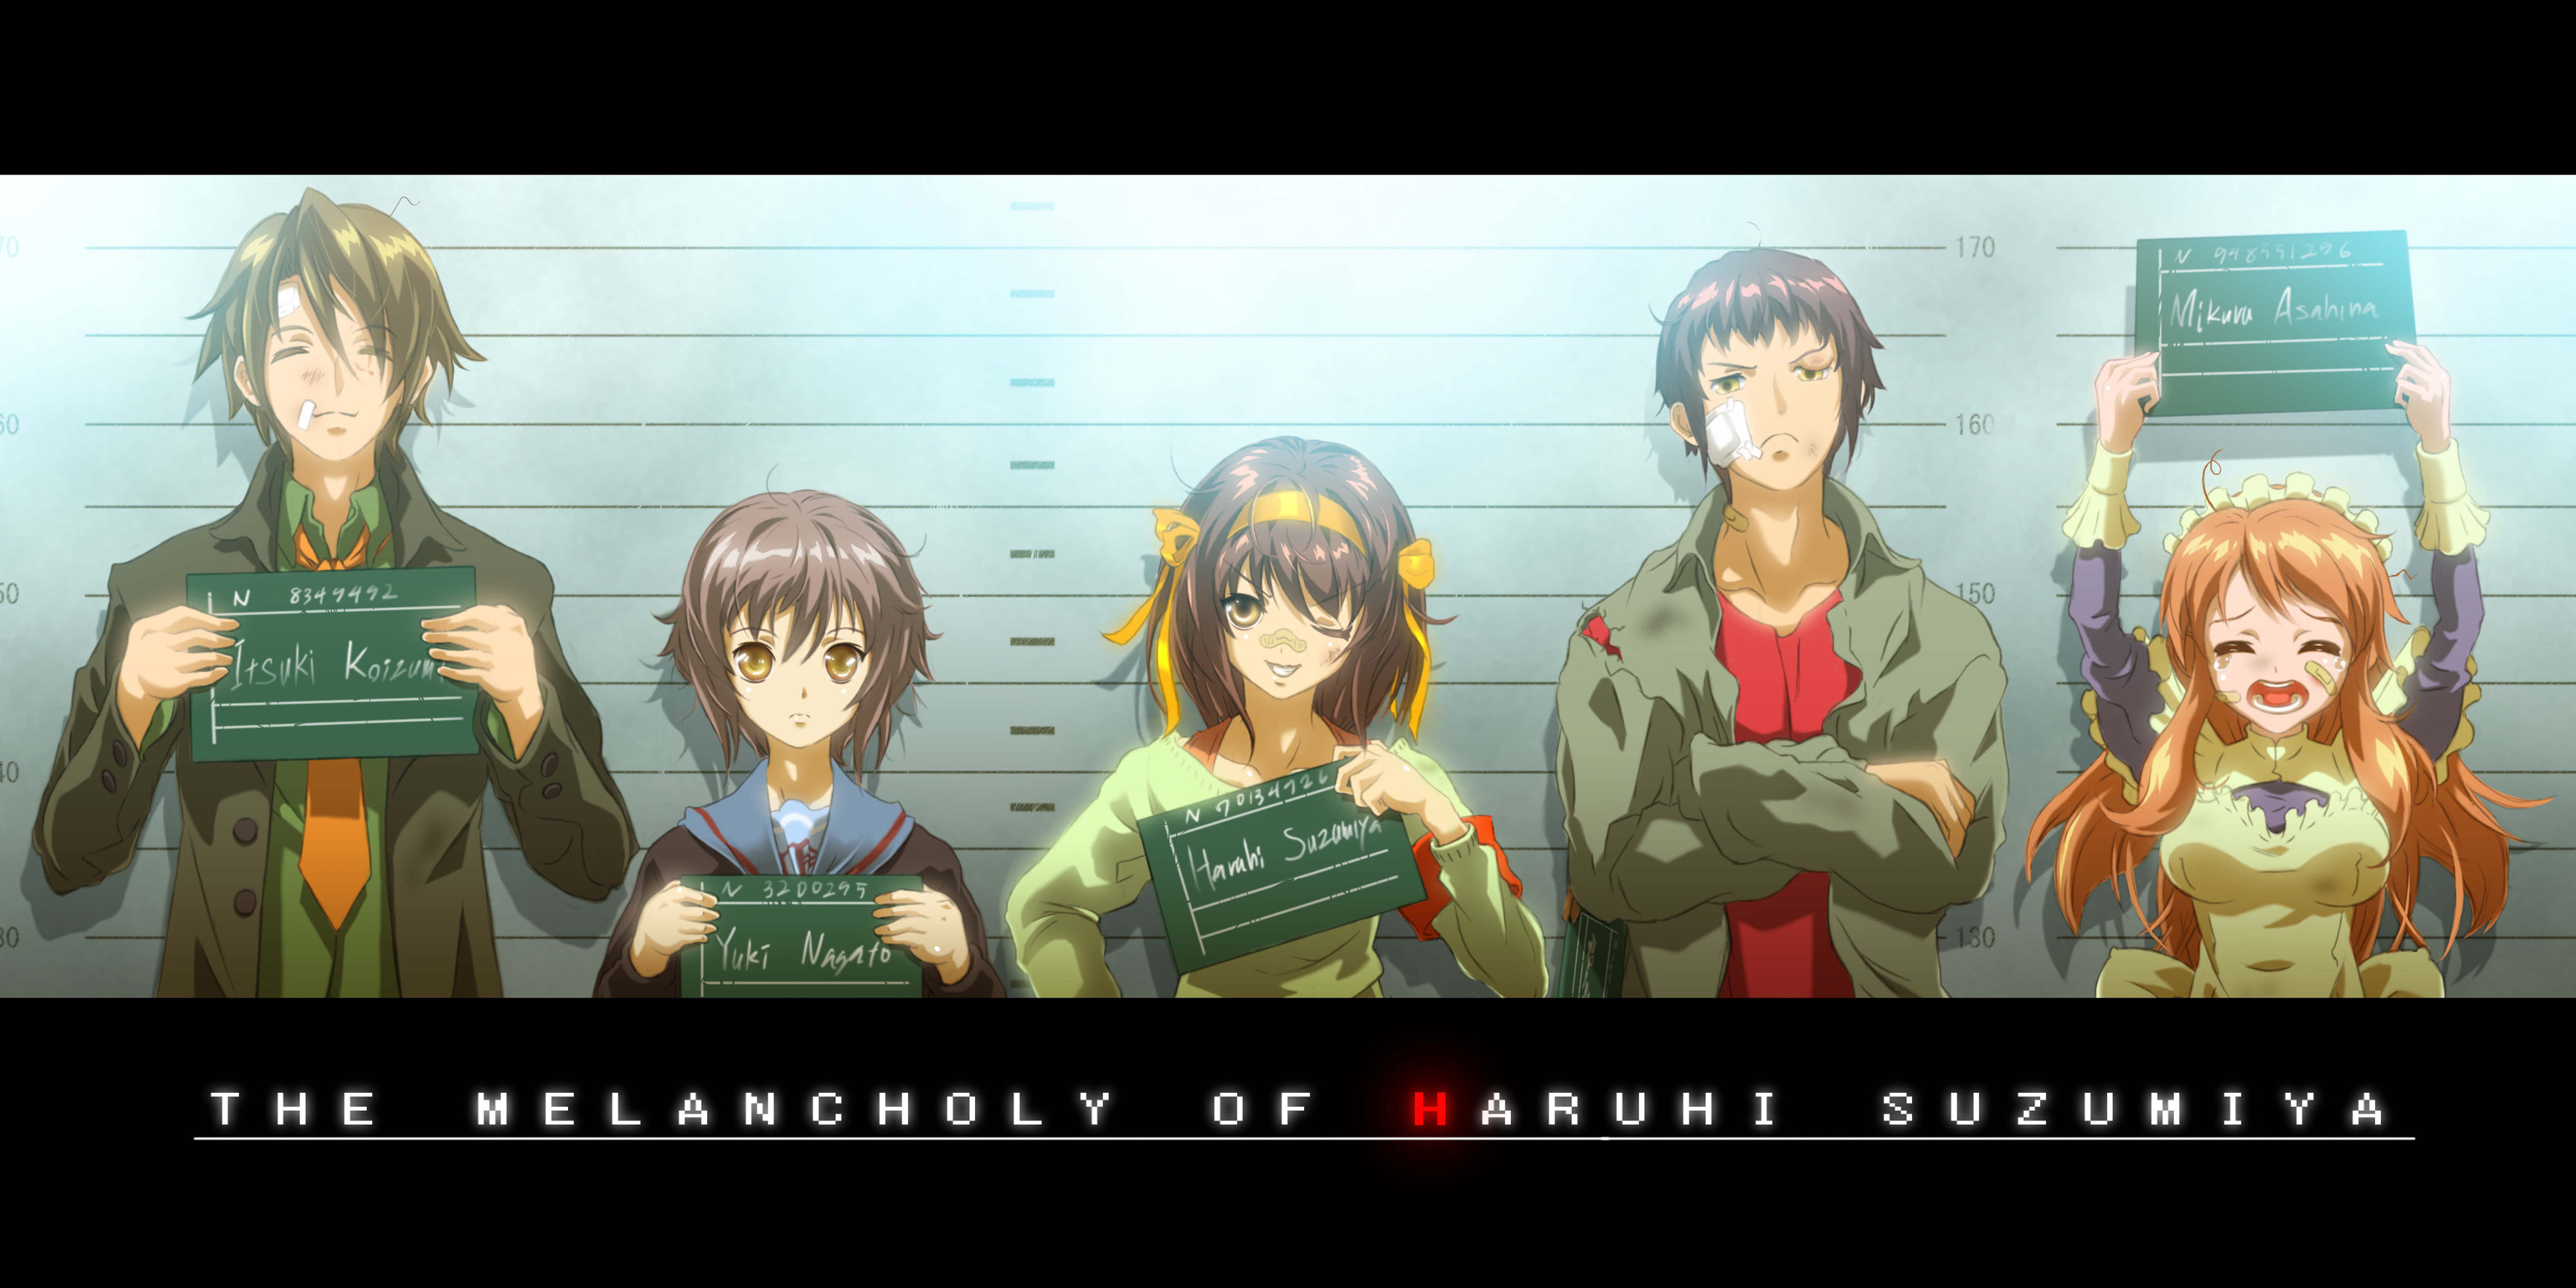 Suzumiya Haruhi No Yuuutsu The Melancholy Of Haruhi Suzumiya